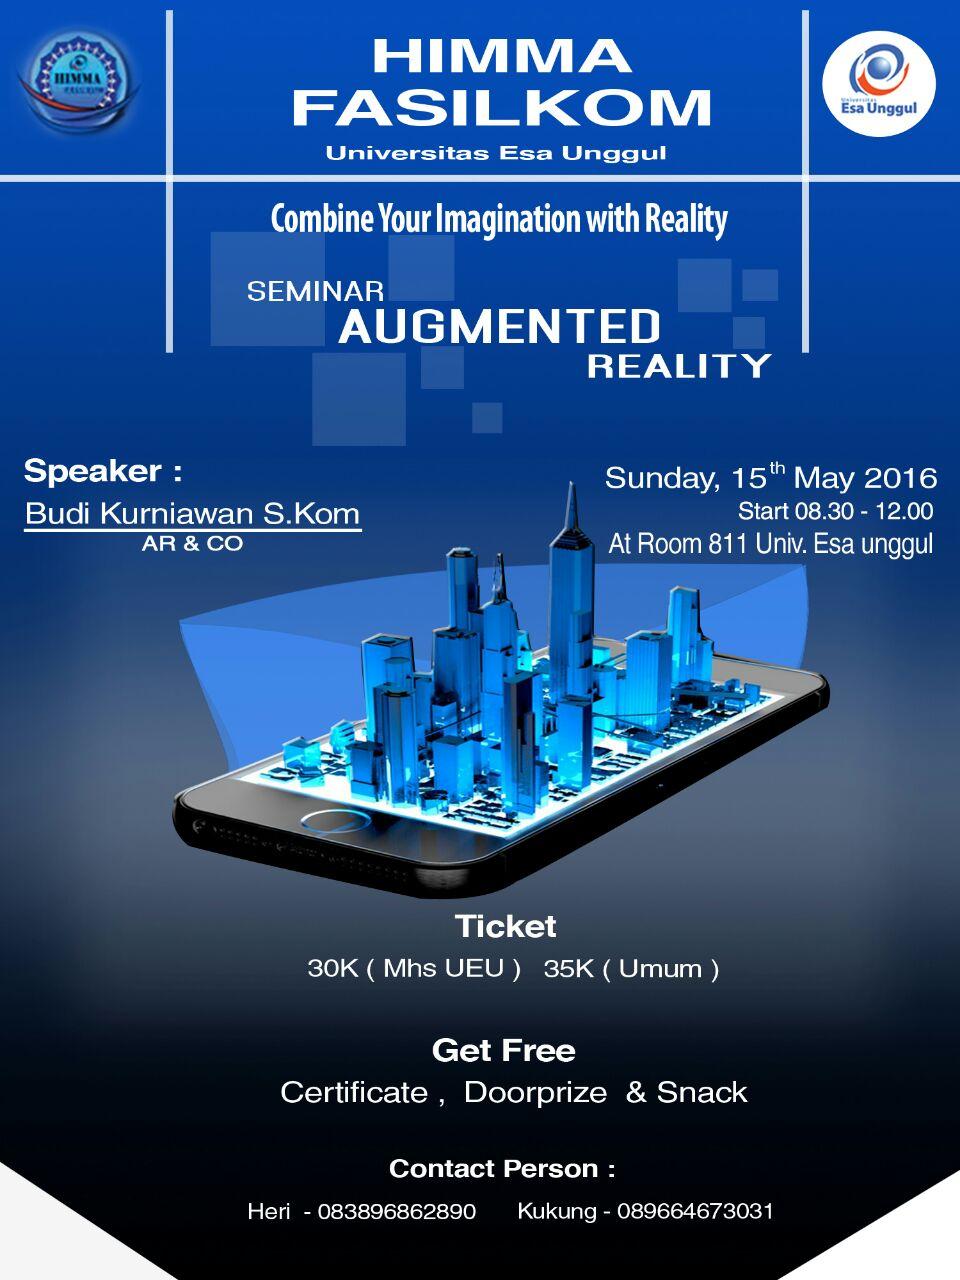 Seminar Augmented Reality, Fakultas Ilmu Komputer